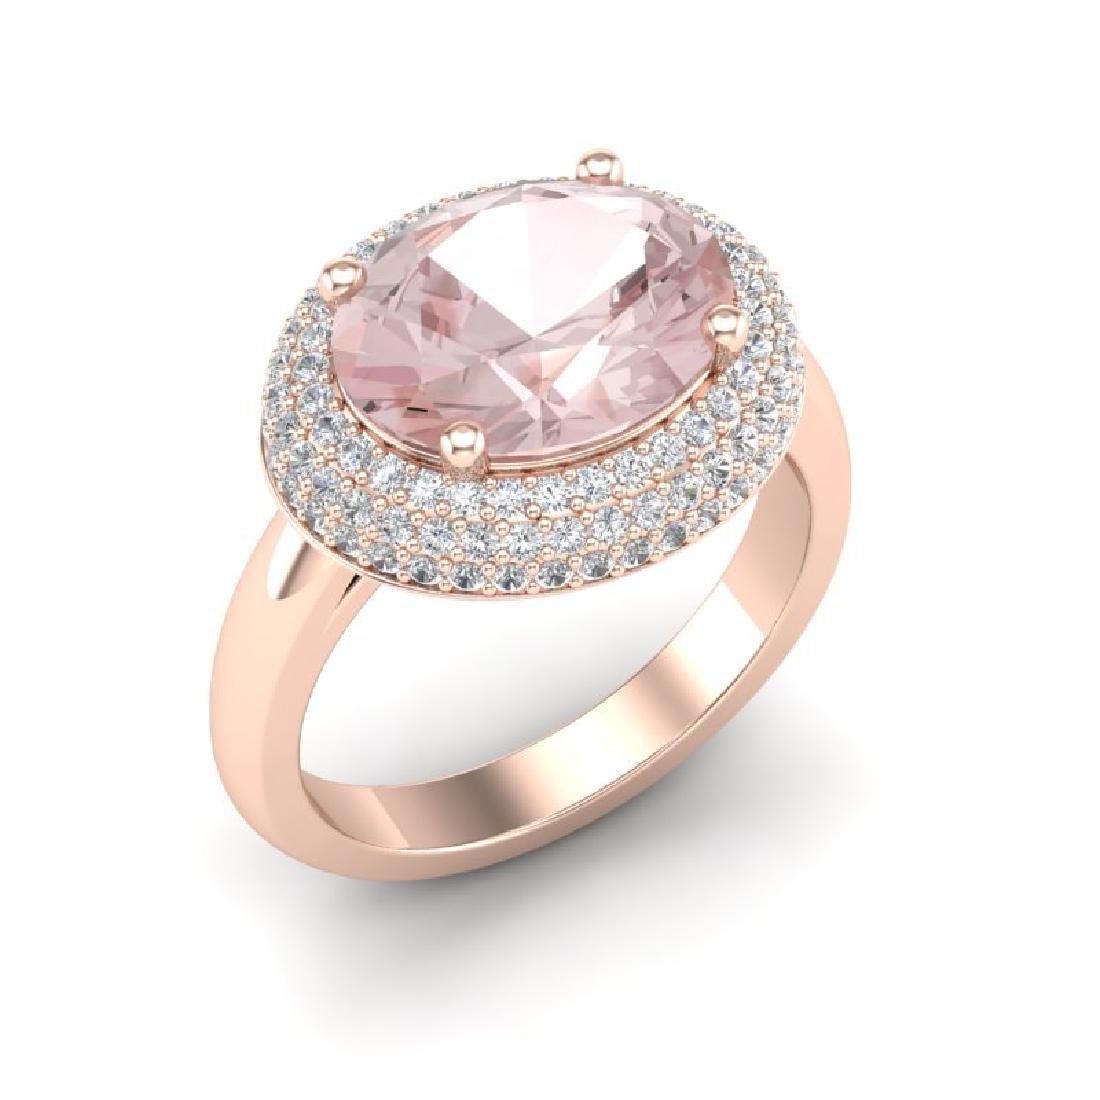 4.50 CTW Morganite & Micro Pave VS/SI Diamond Ring 14K